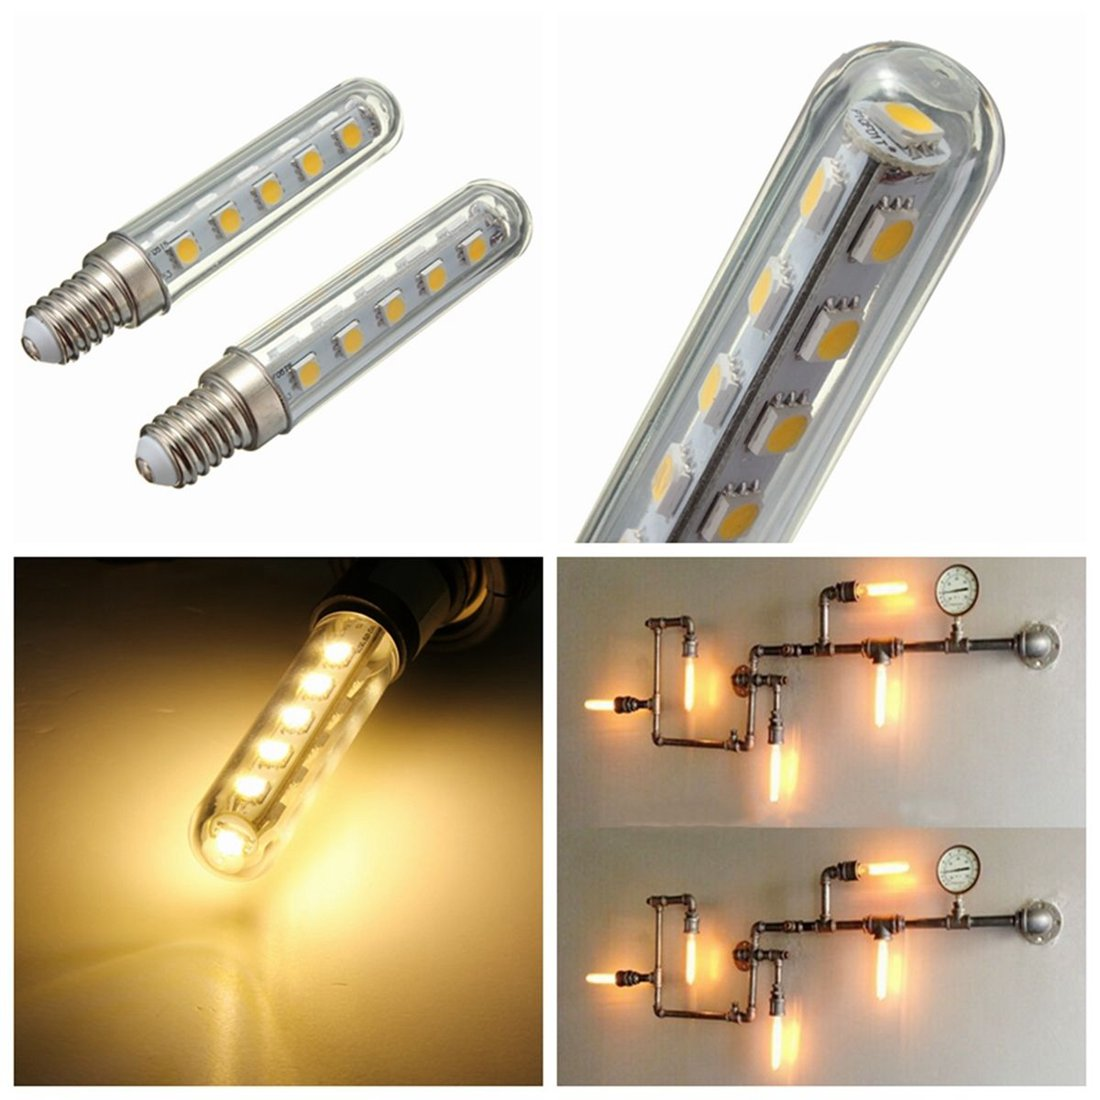 2pcs 2.5W Led Light Bulb For Kitchen Hood Exhaust Cooker